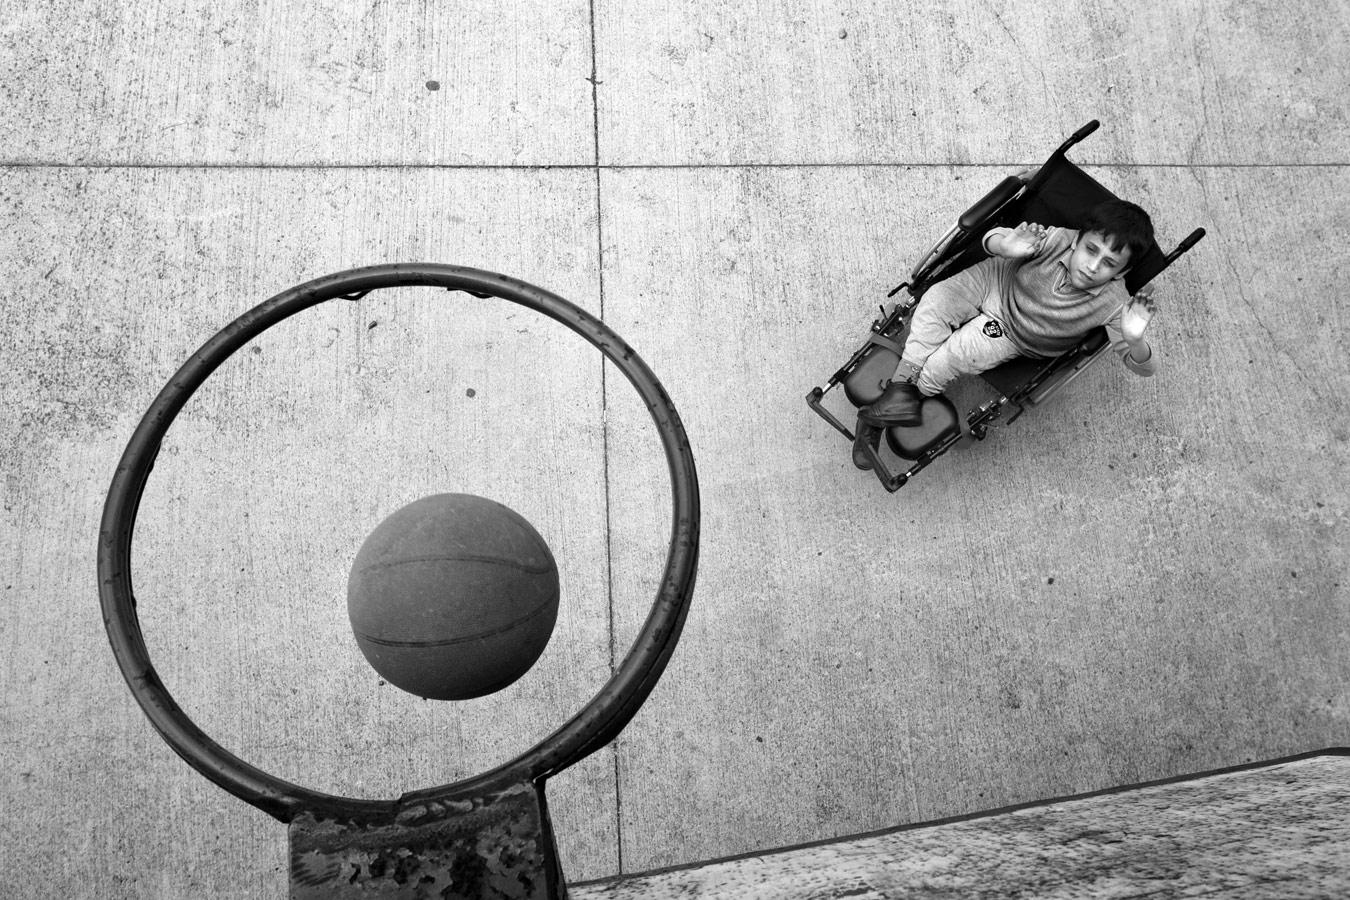 © Лейла Эмектар, Фотоконкурс Международной федерации баскетбола — FIBA Photo Contest